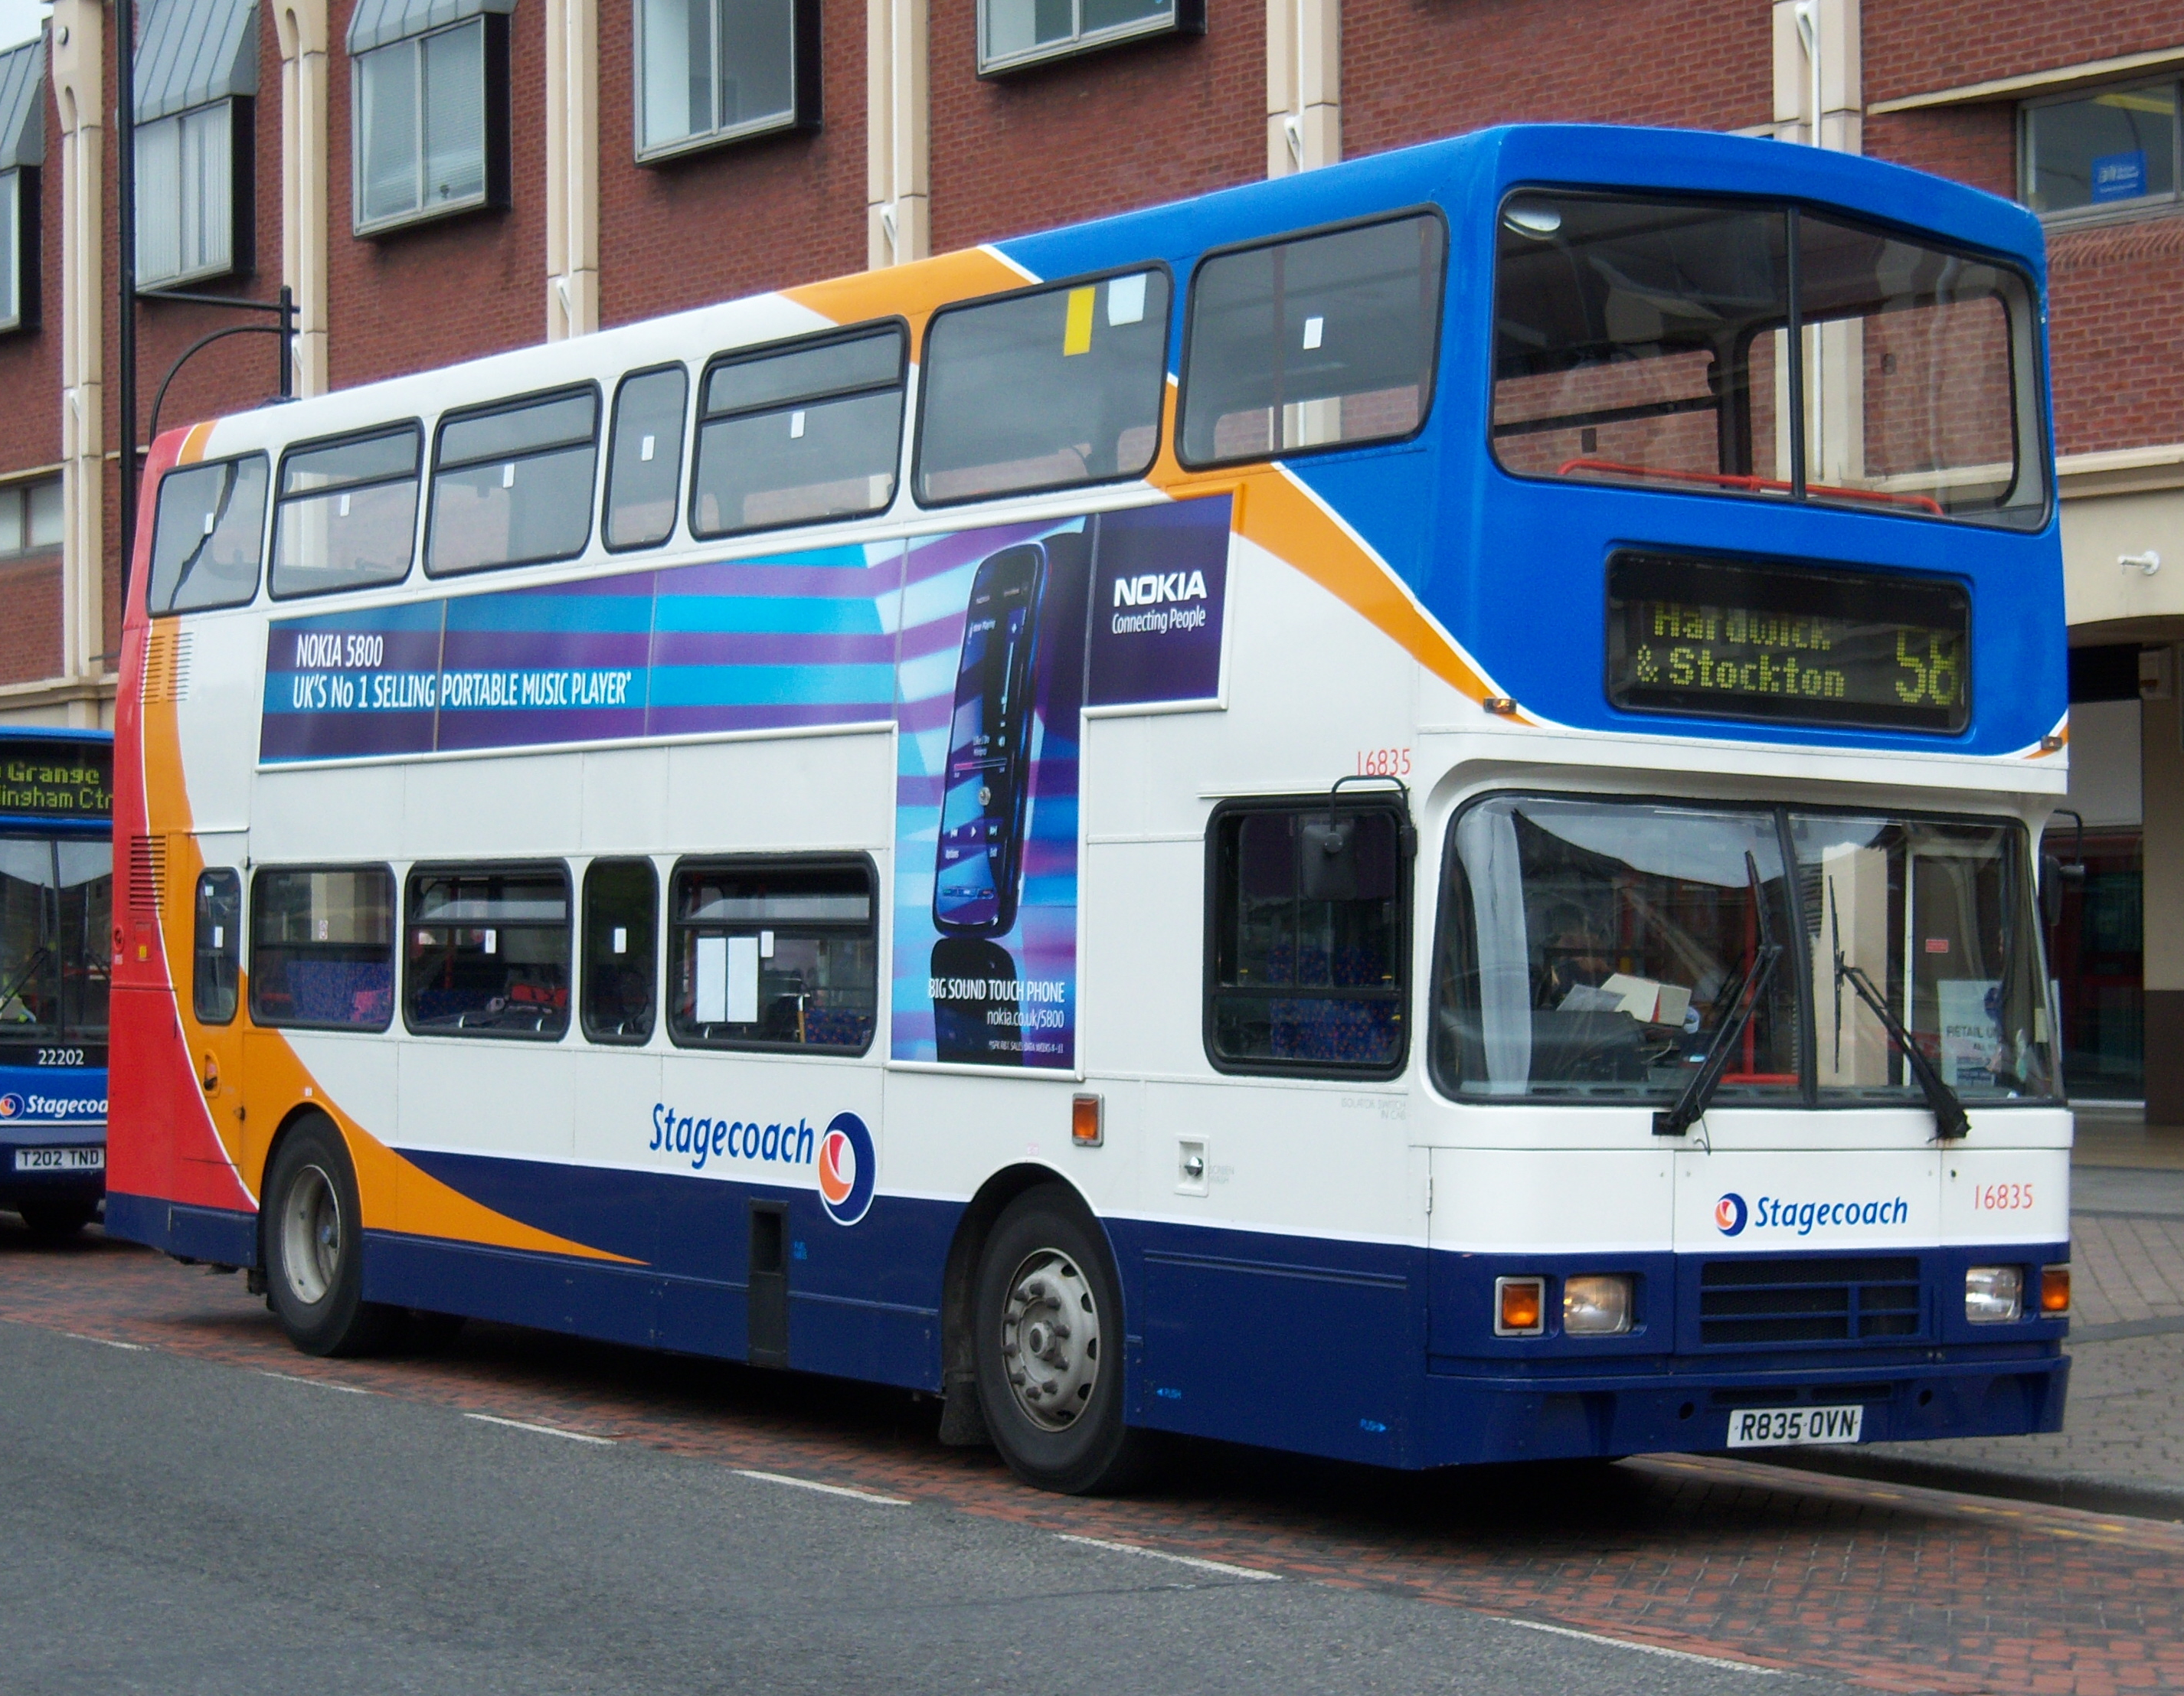 File:Stagecoach bus 16835 Volvo Olympian Alexander RL R835 ...